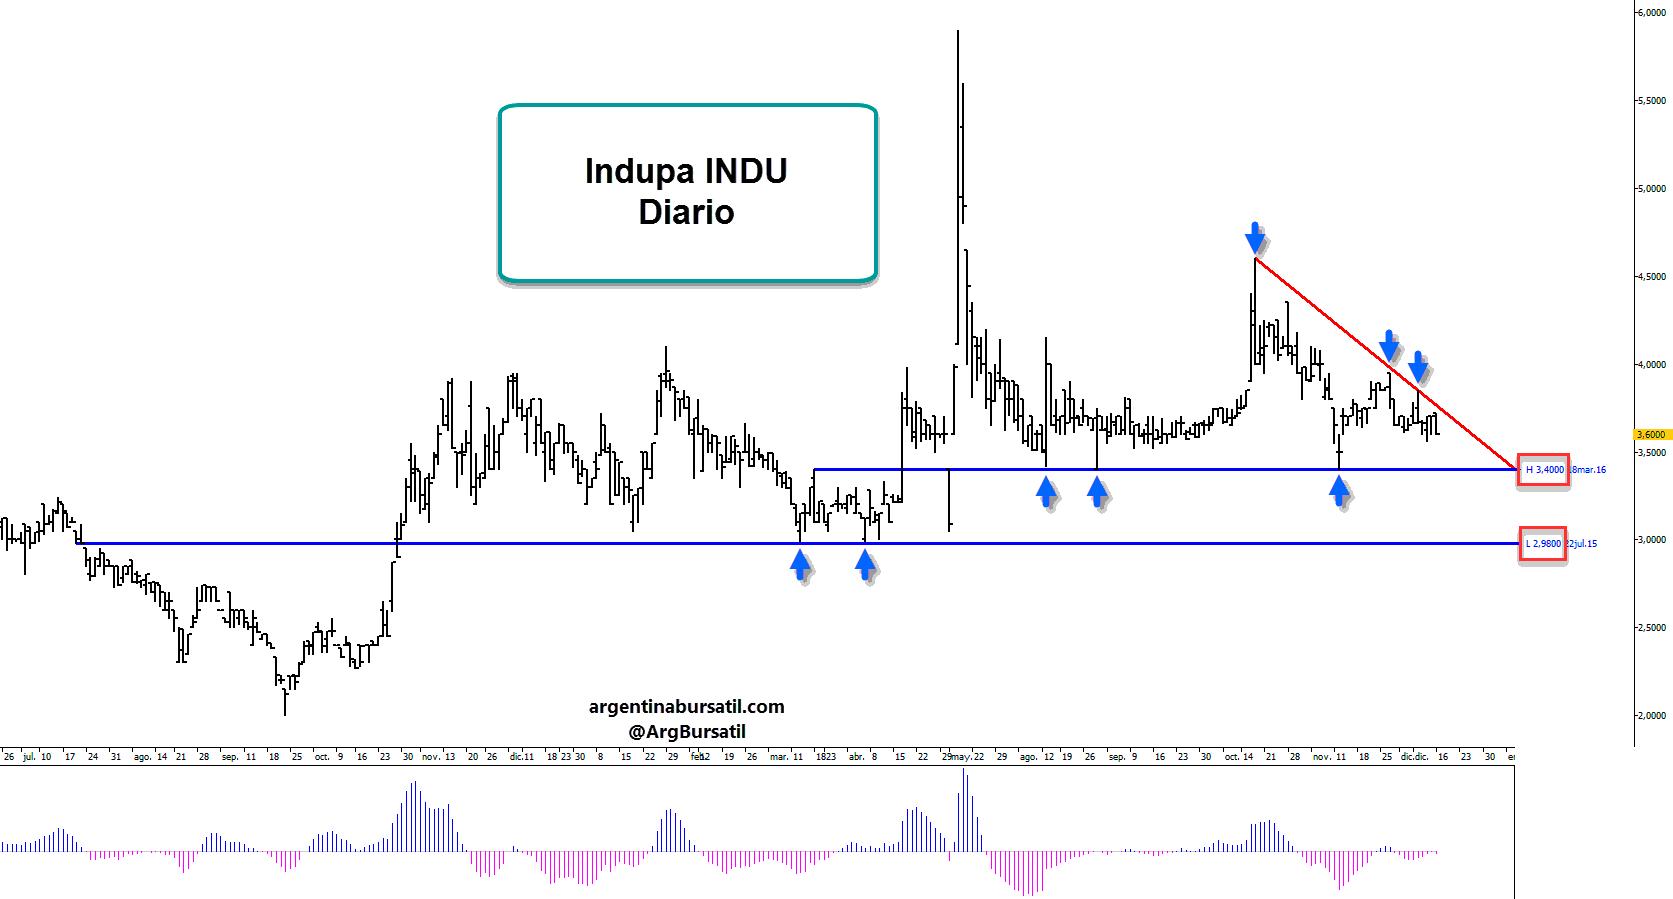 Indupa